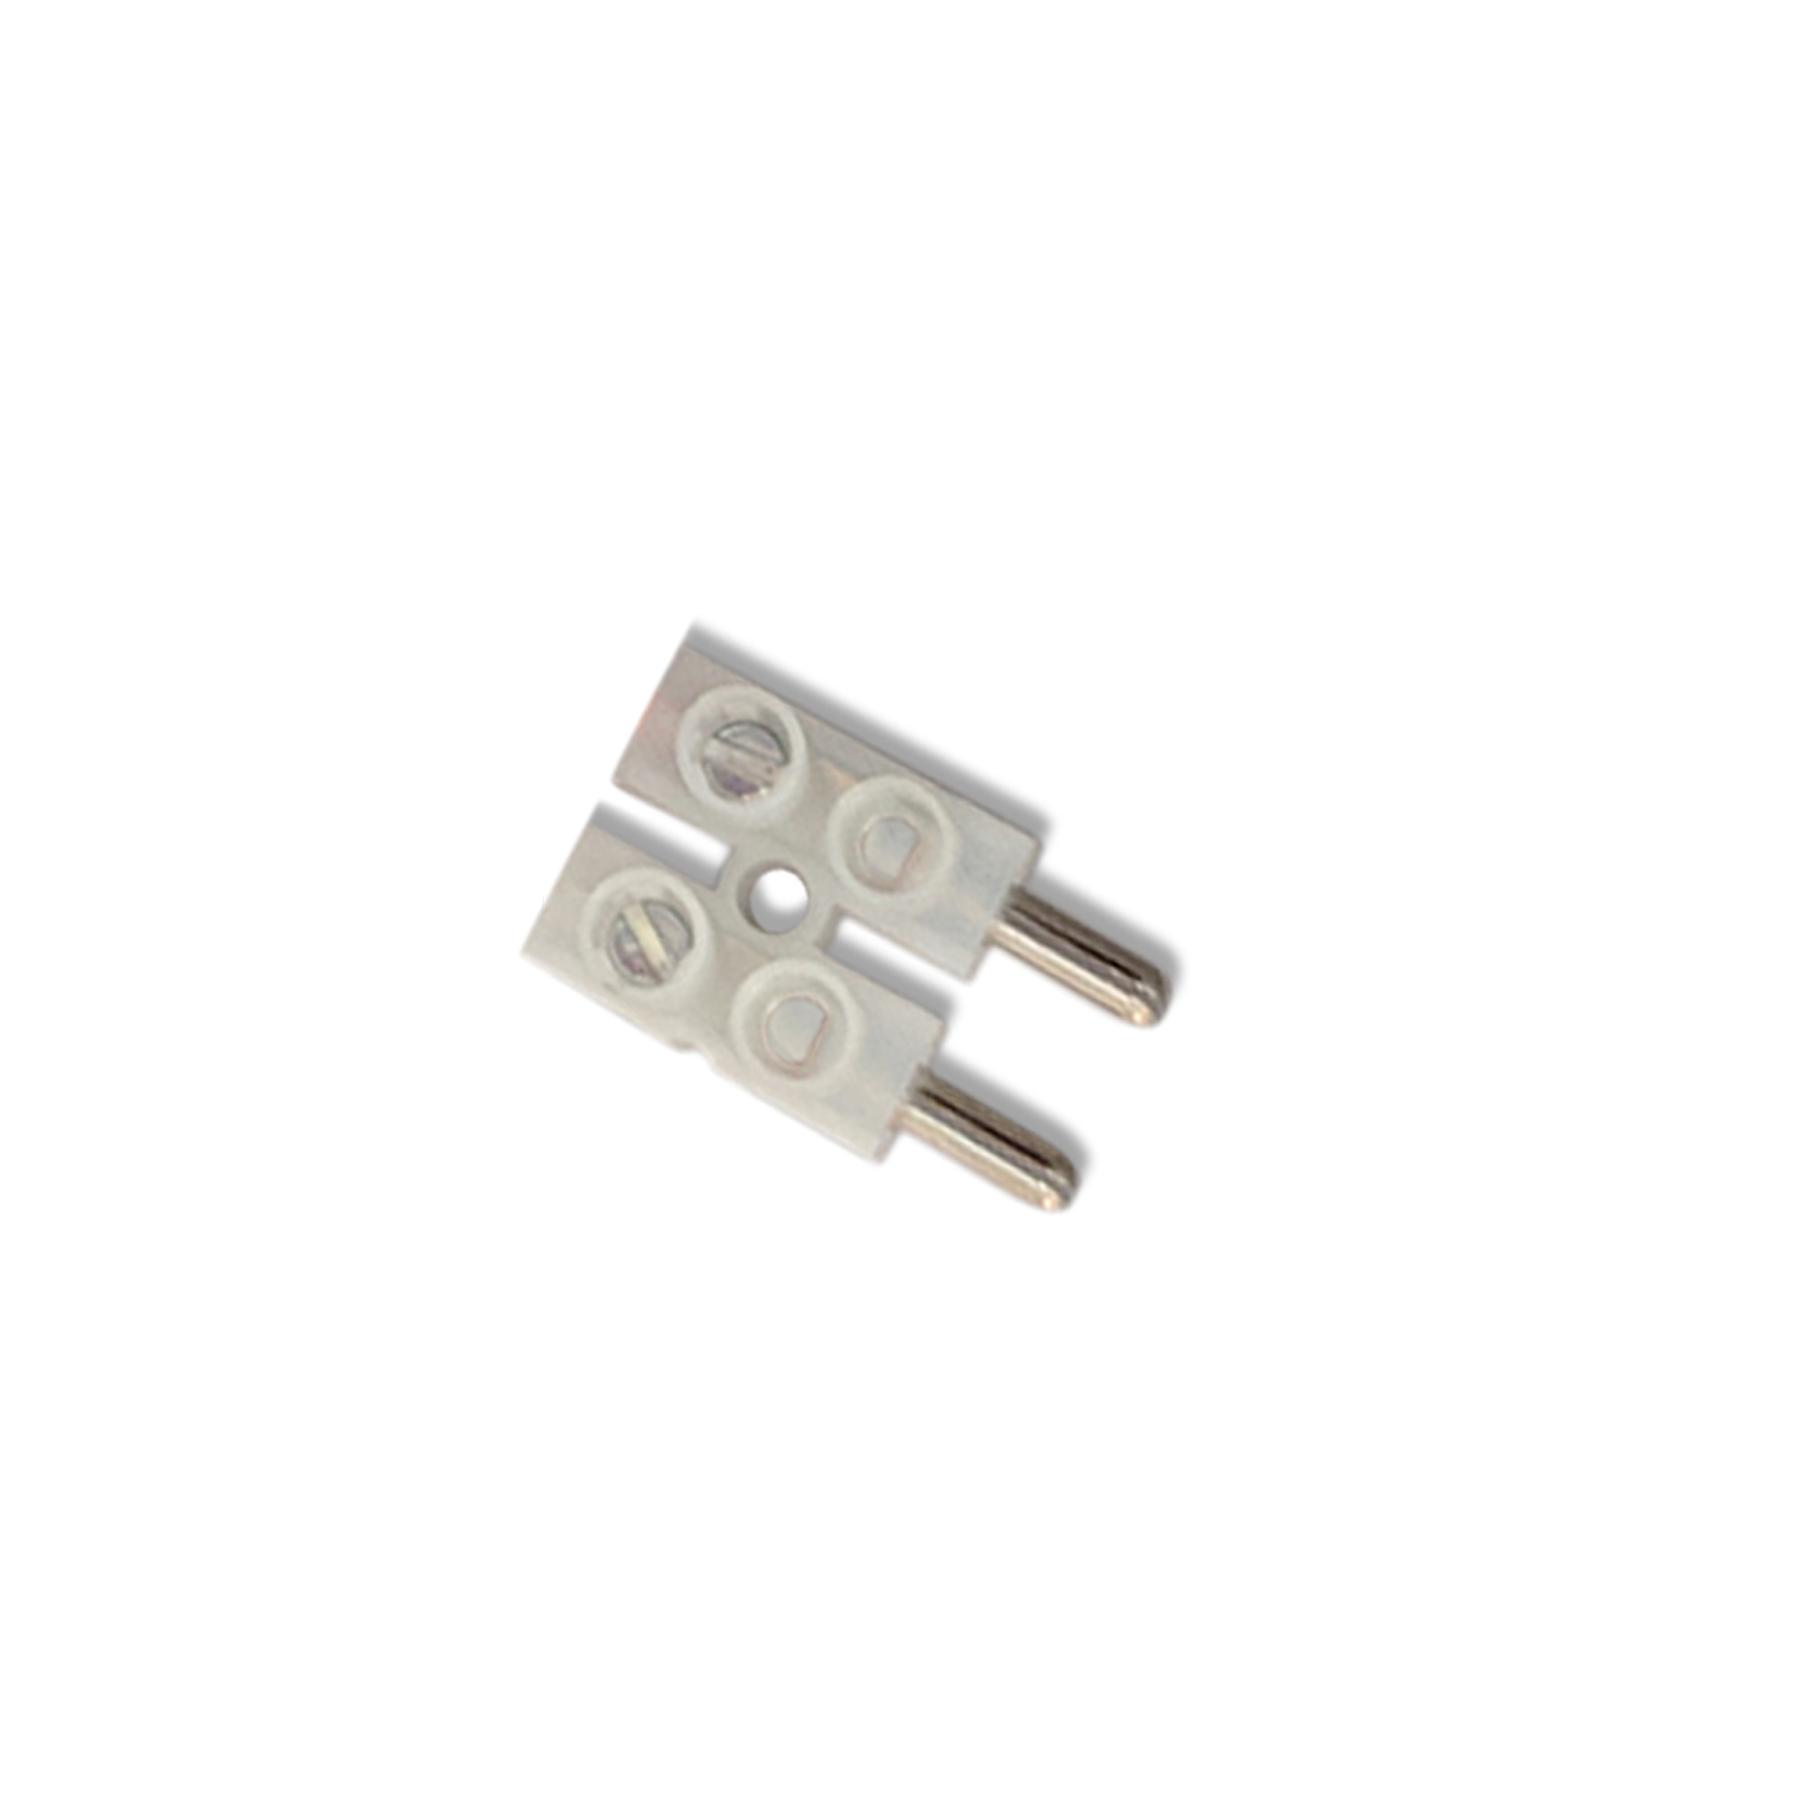 2-Pin Thermostat Plug